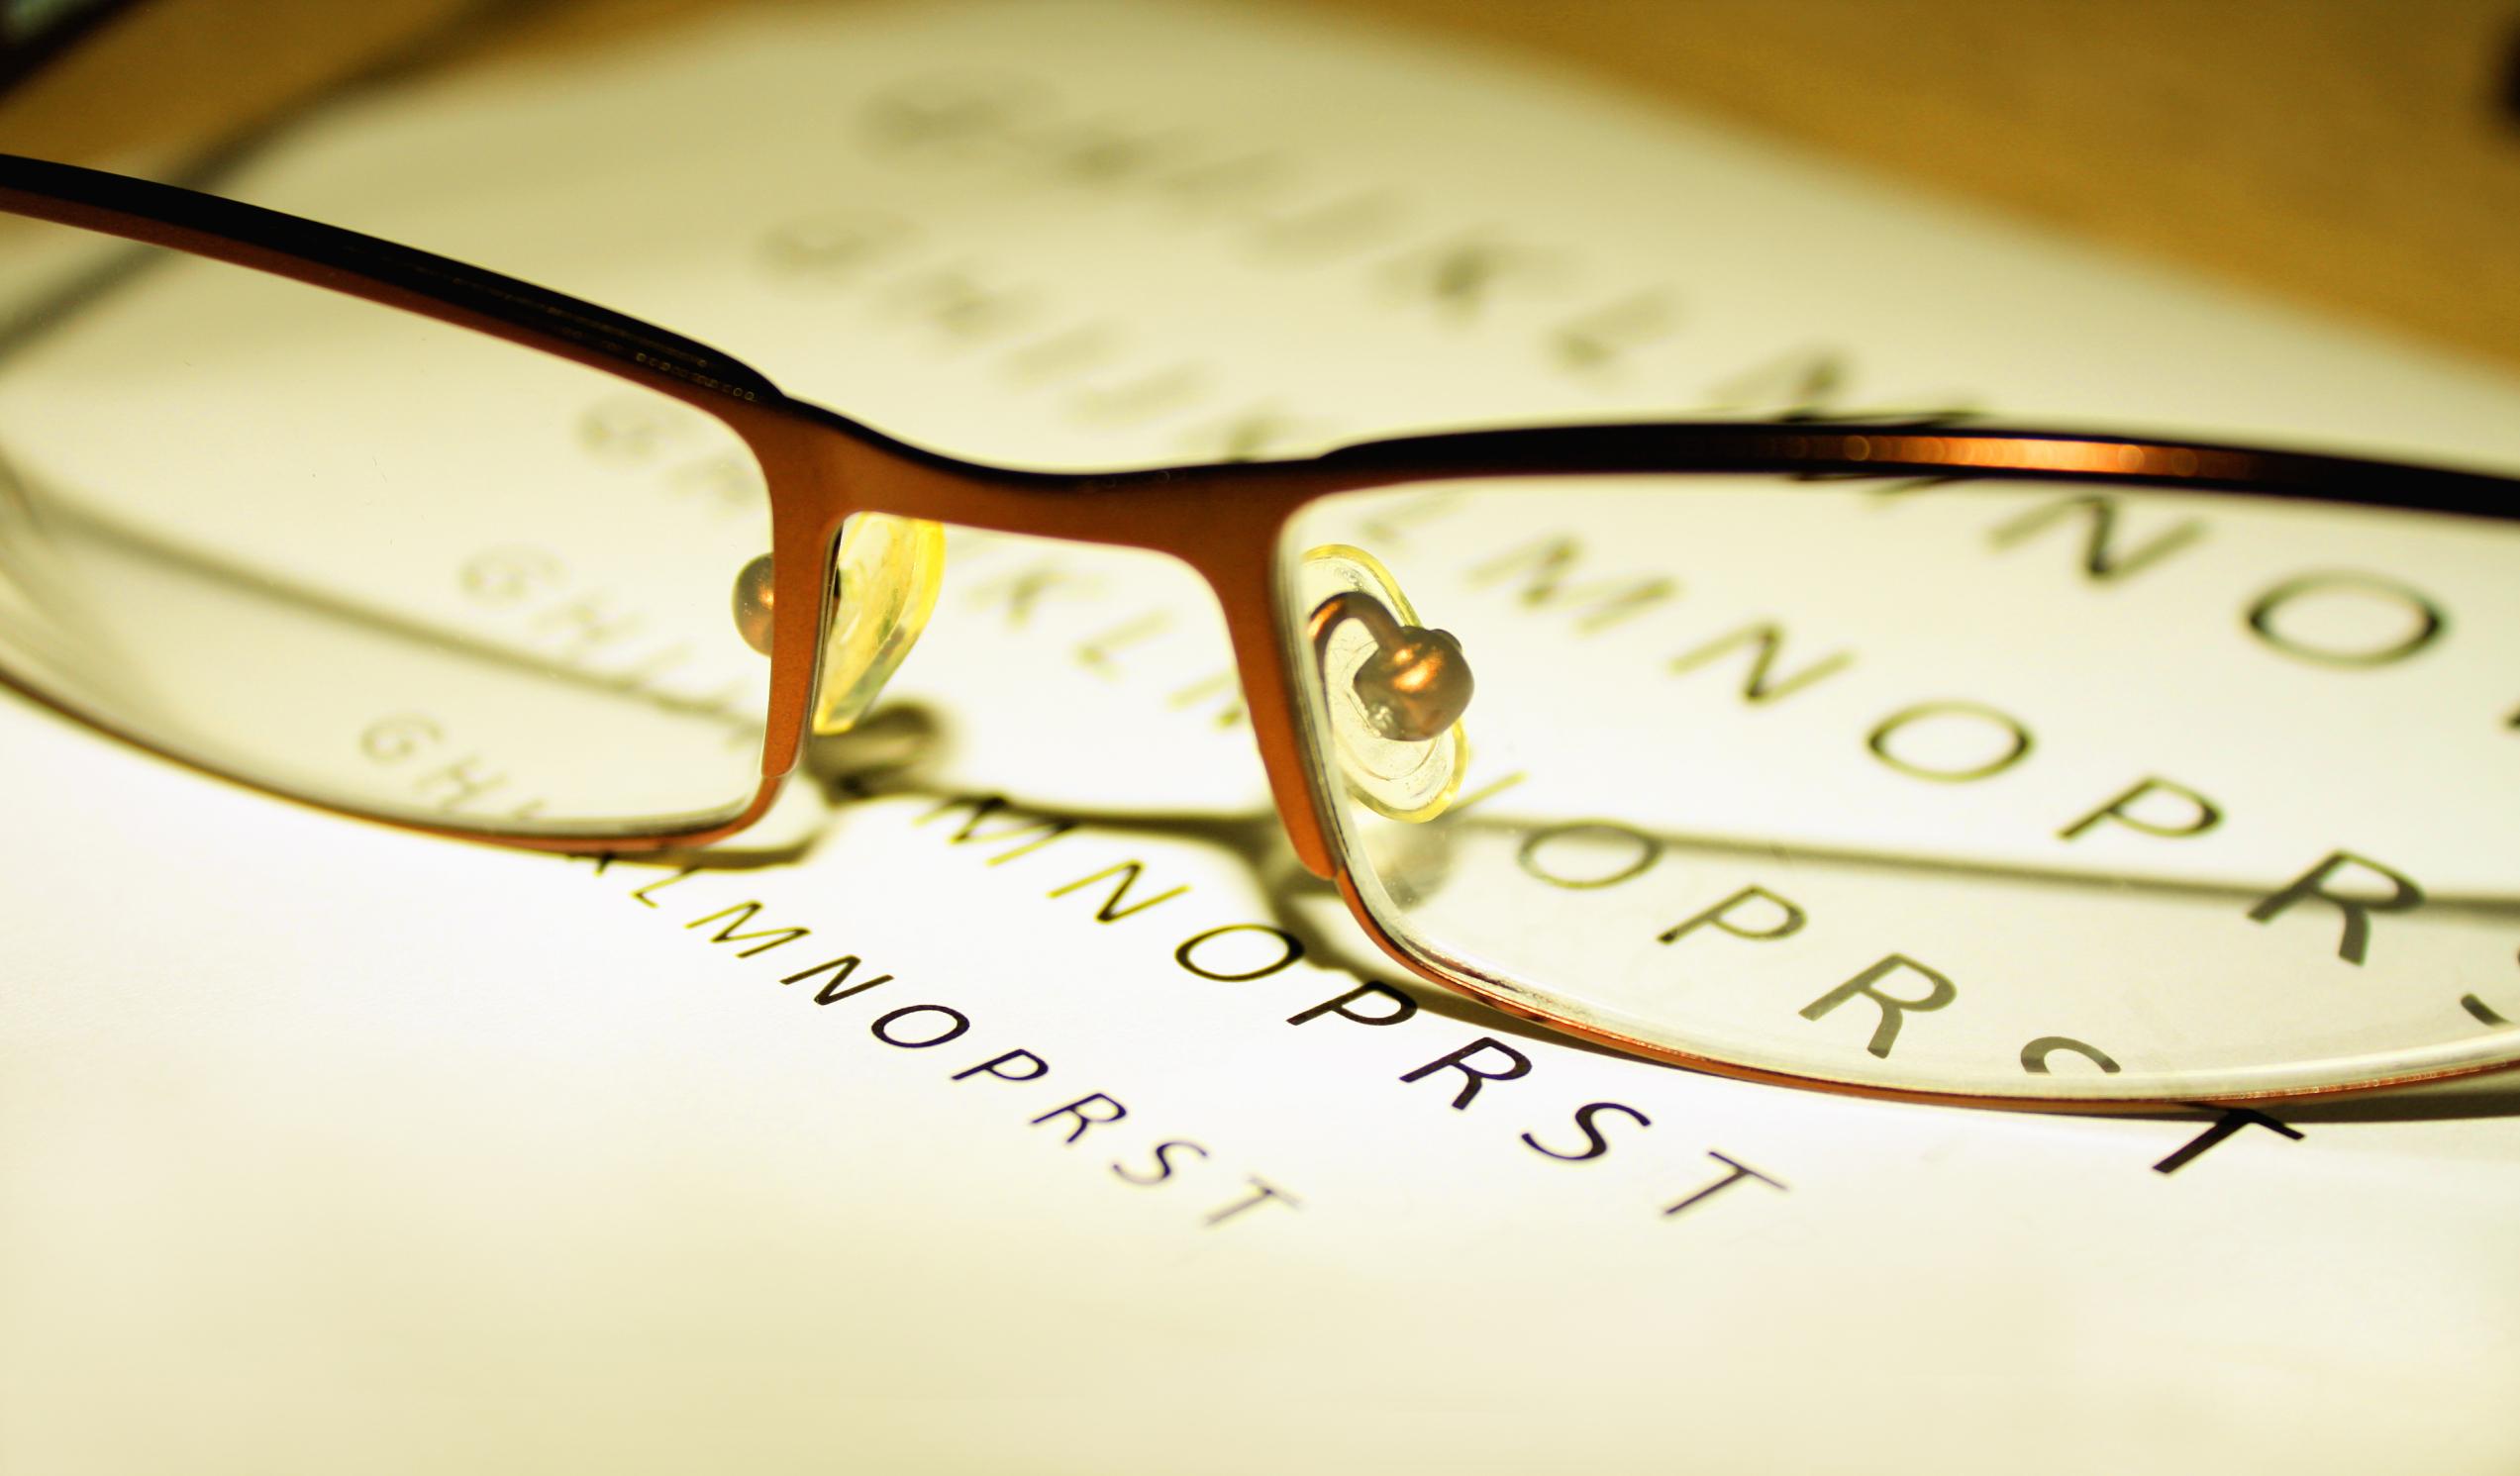 se poate deteriora vederea din cauza oboselii